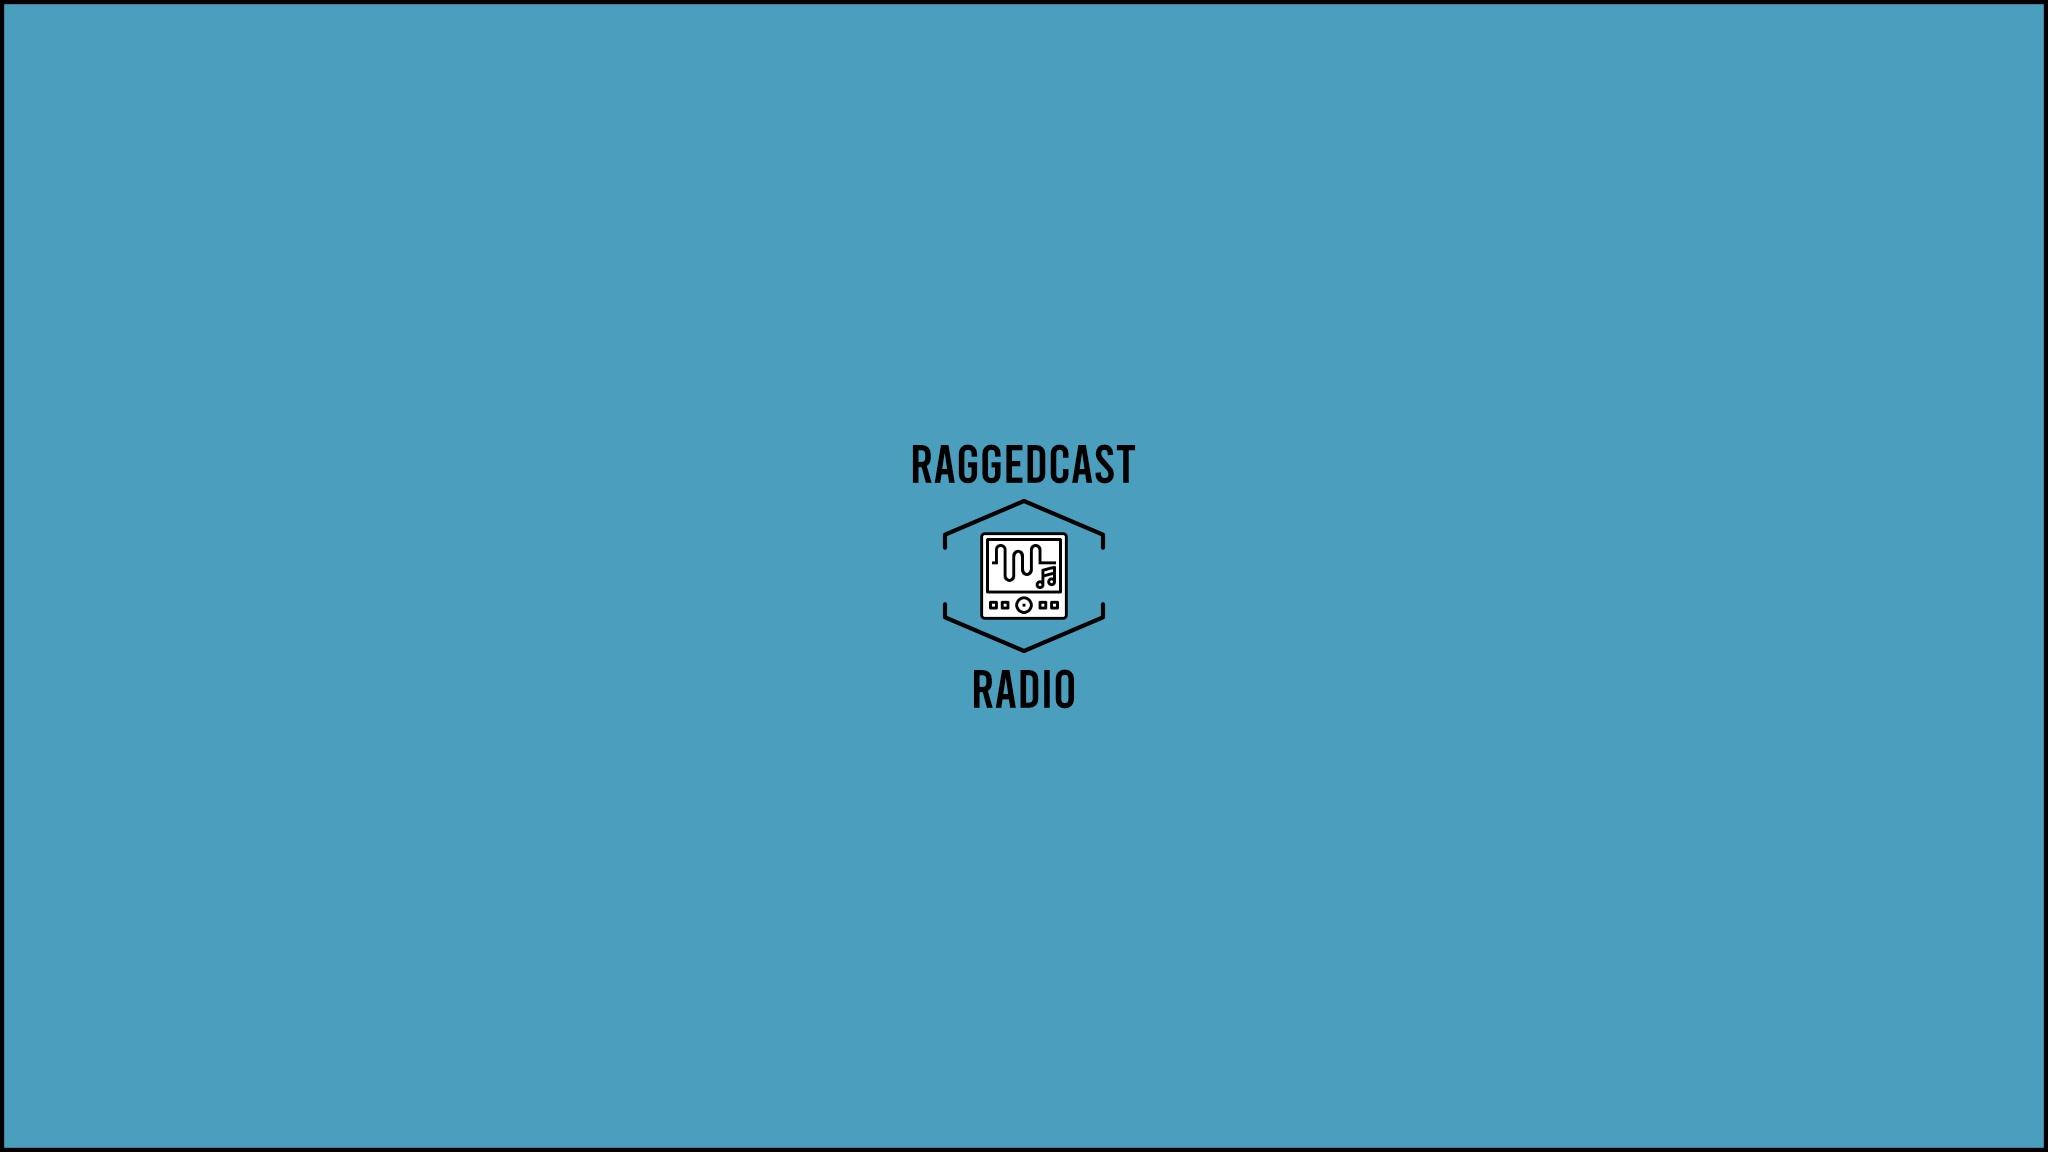 raggedcast Cover